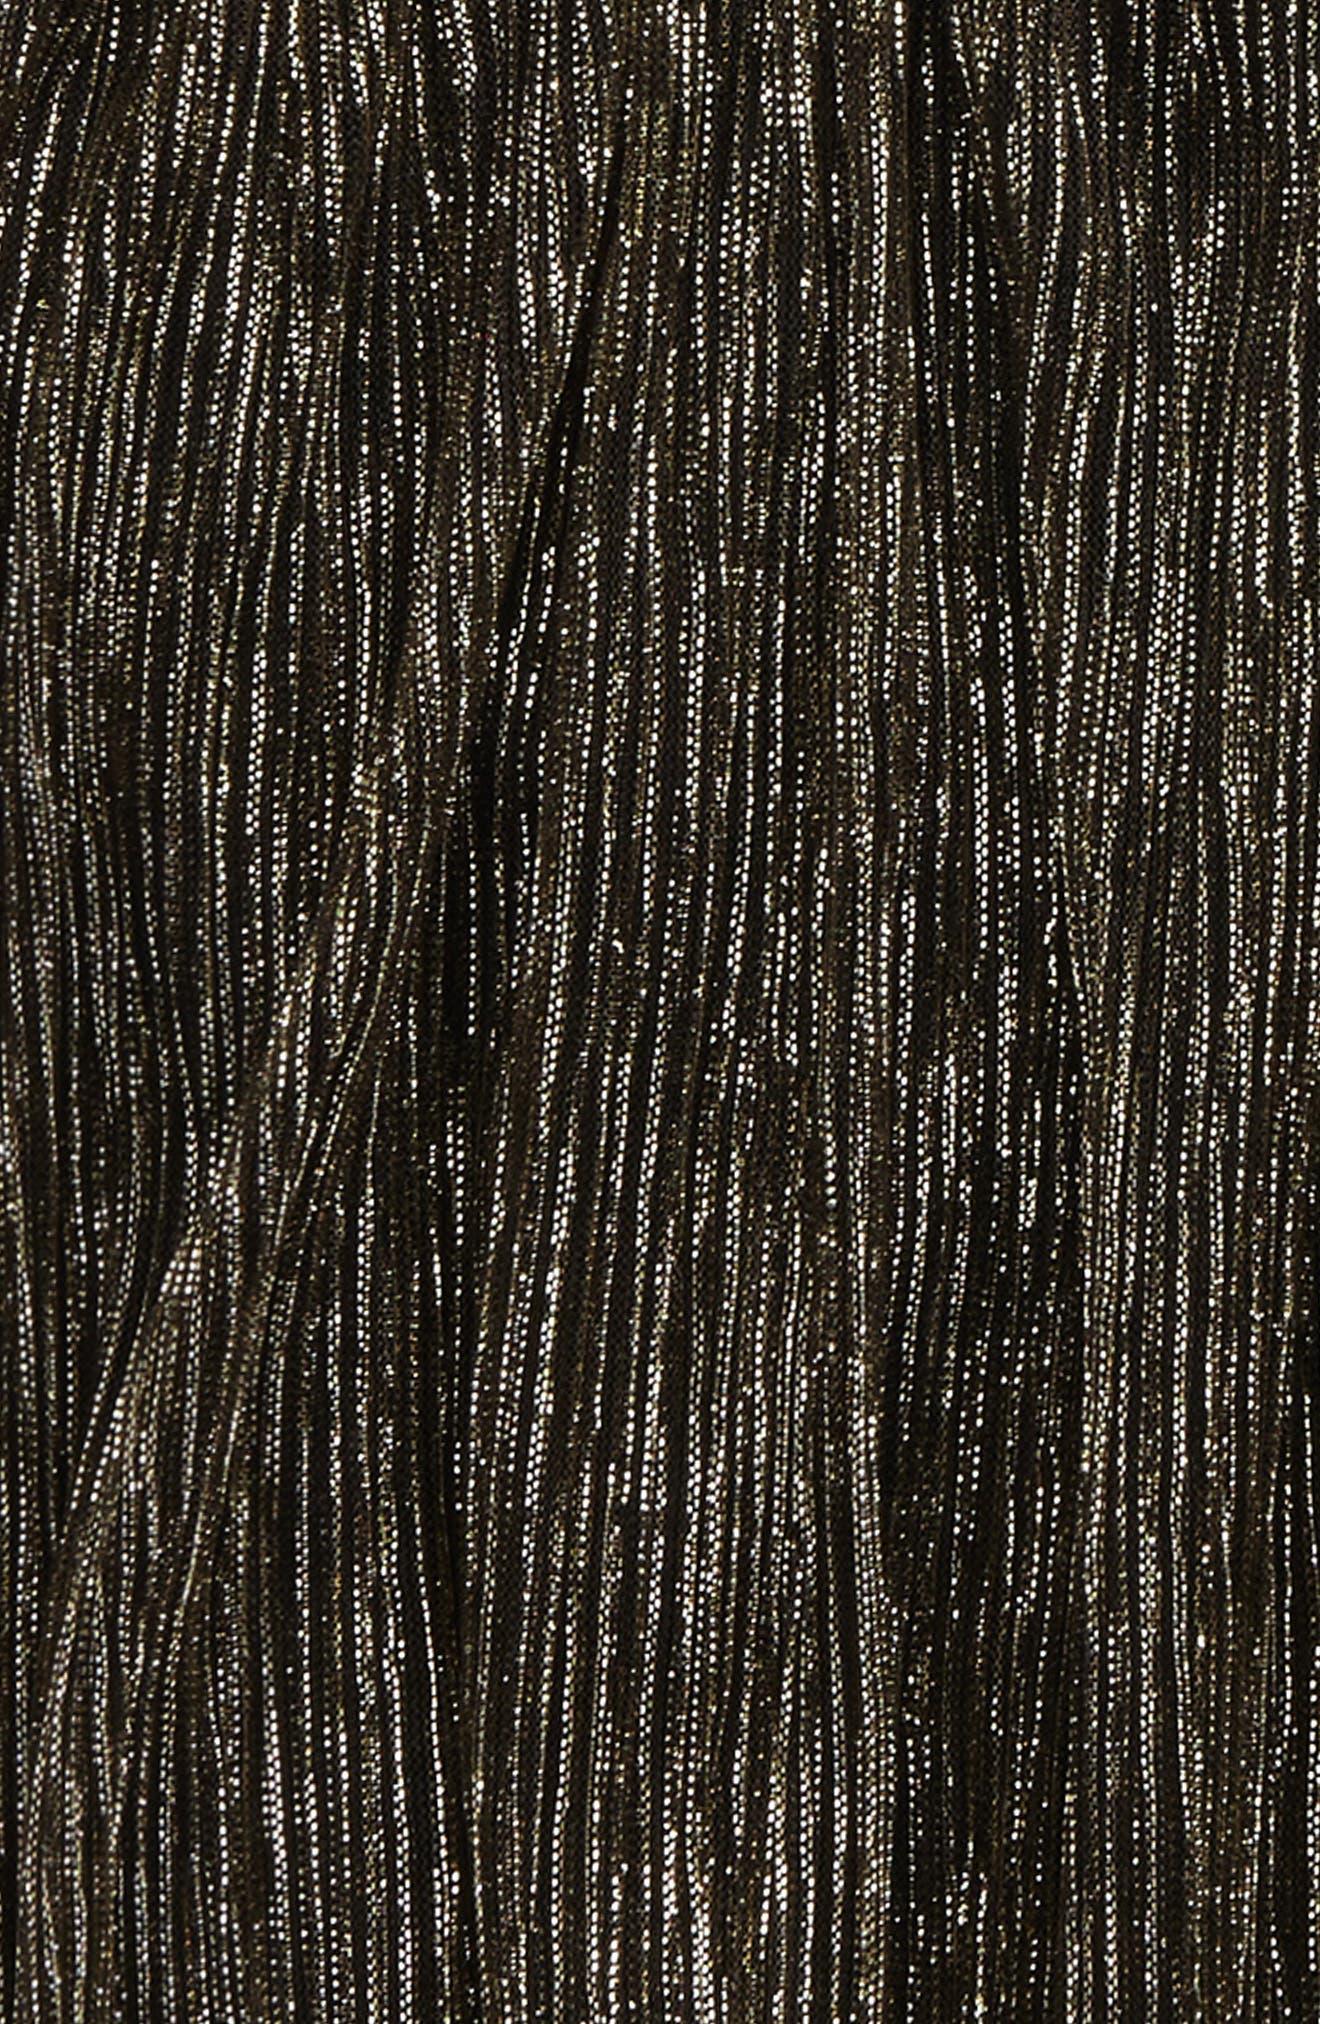 Pleated Metallic Skirt,                             Alternate thumbnail 2, color,                             220